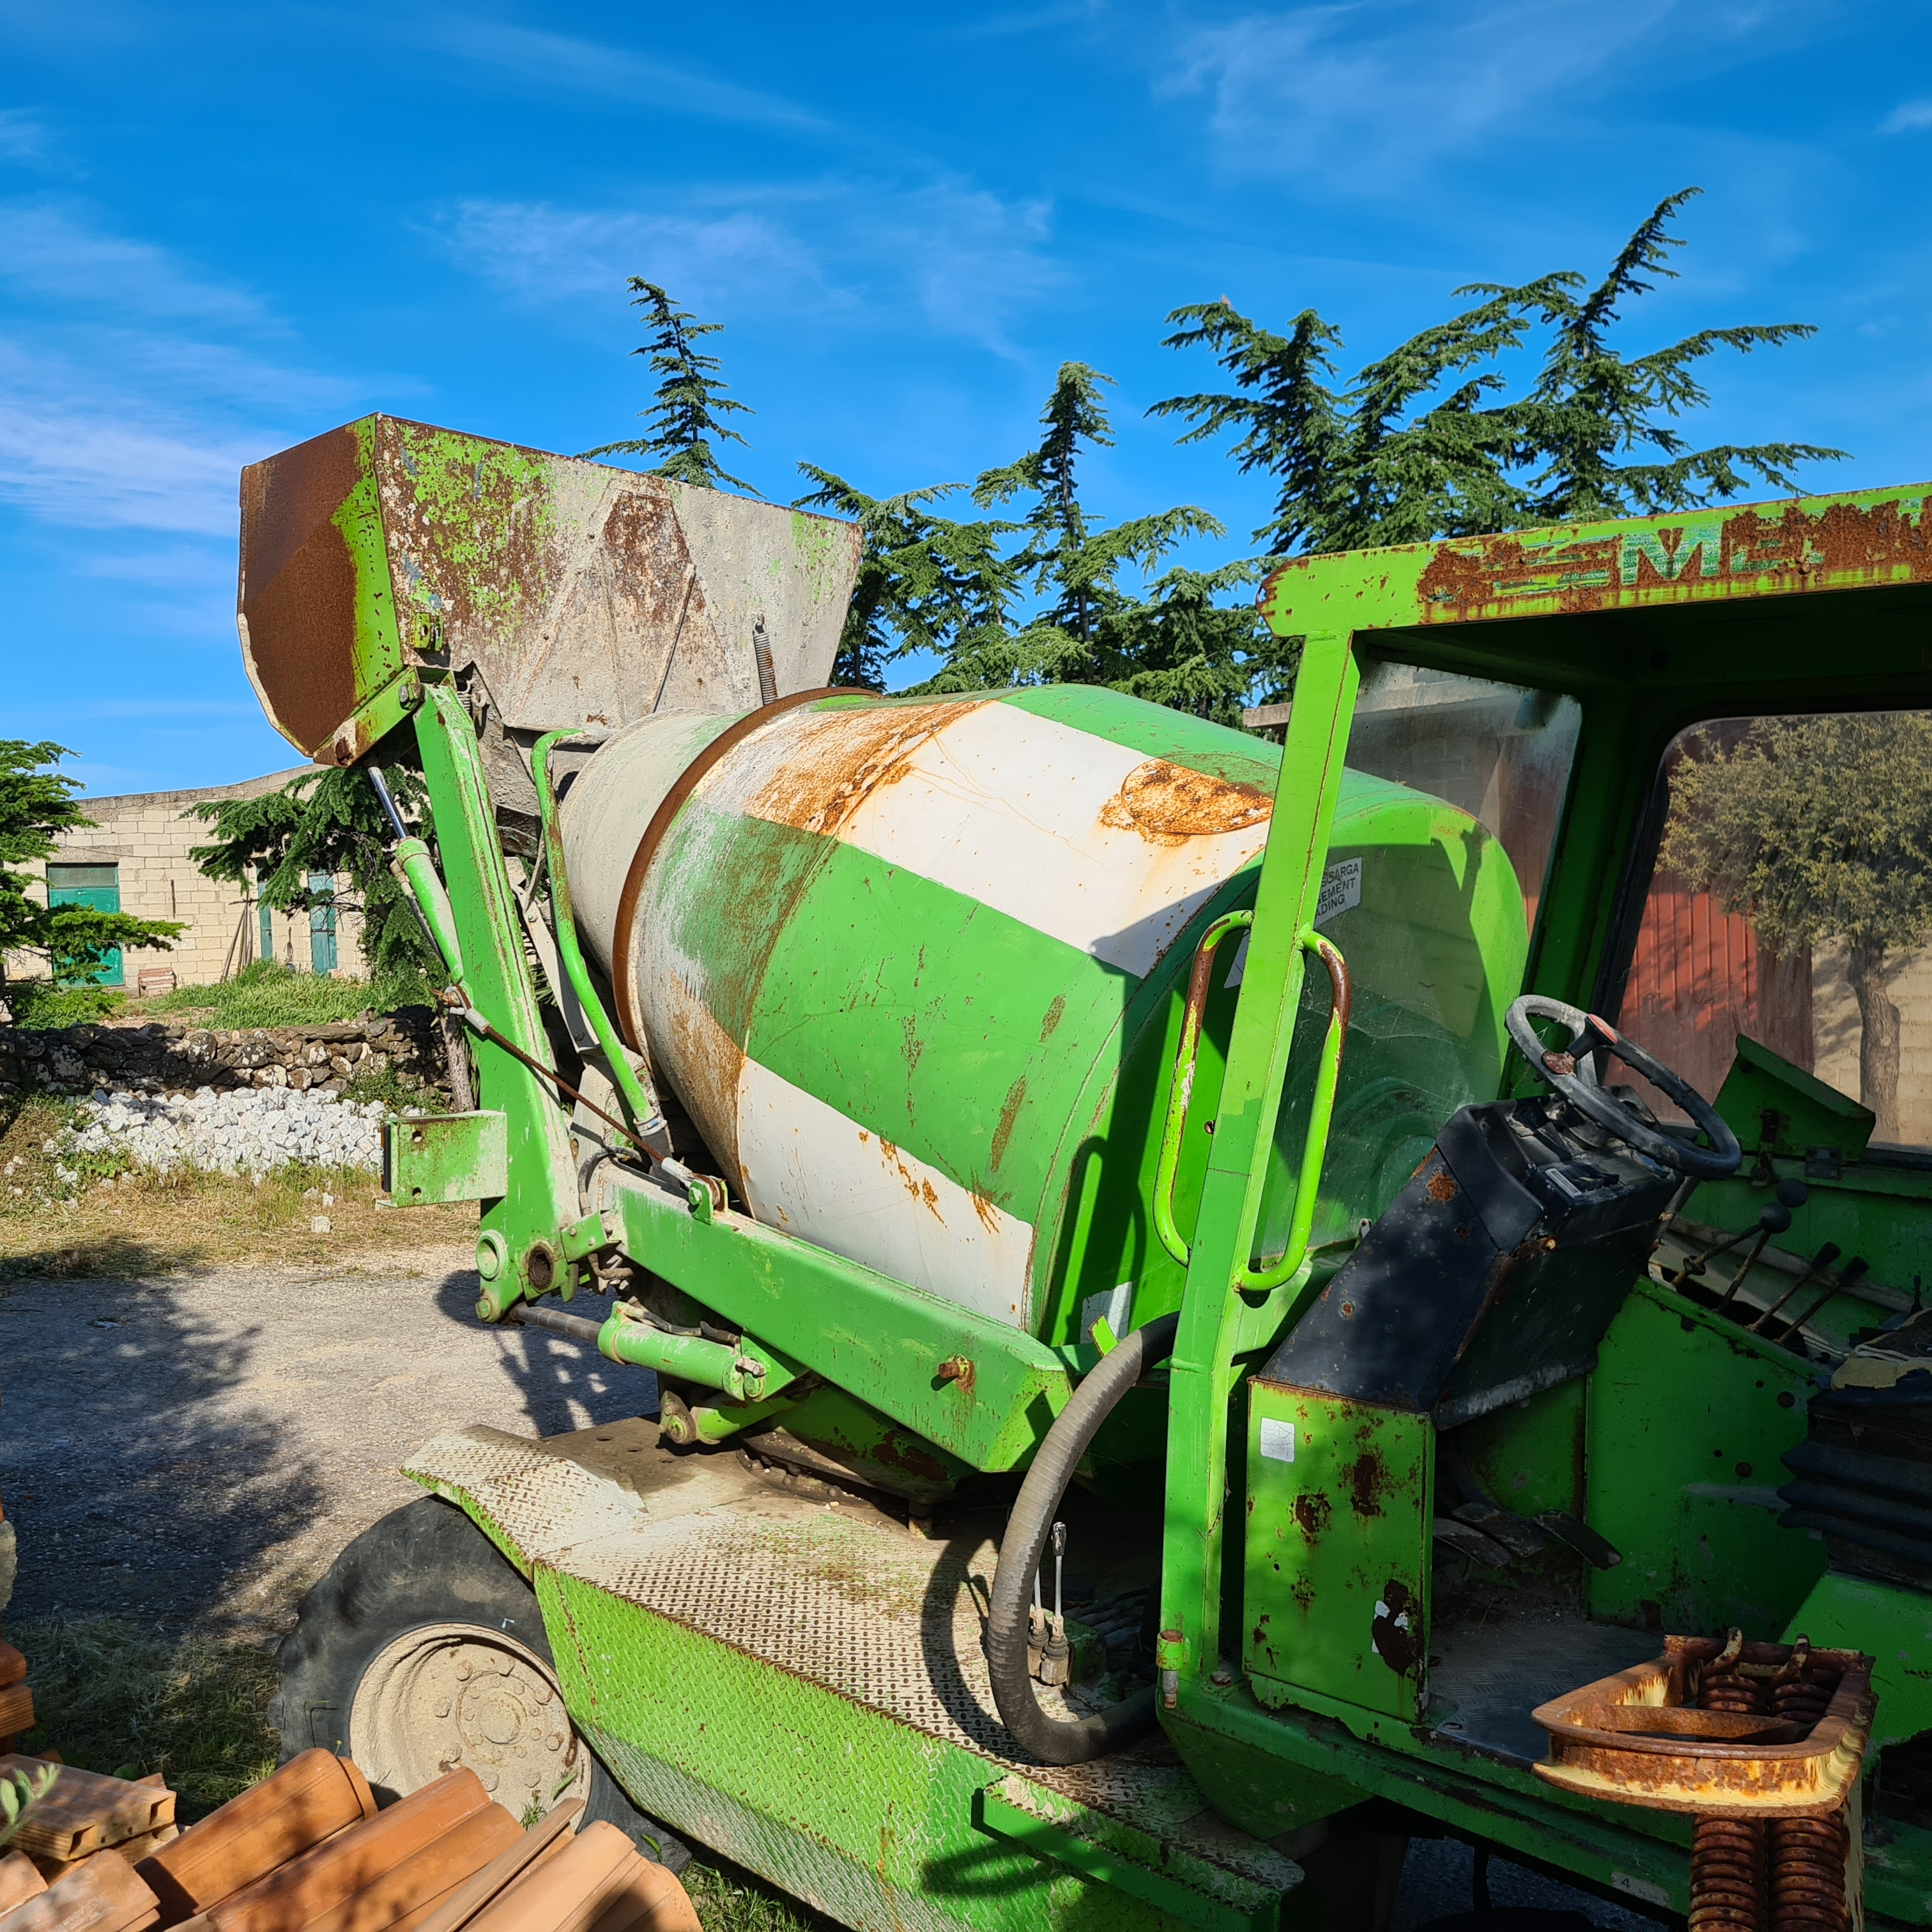 Merlo dumper betoniera dbm 2500 in vendita - foto 8